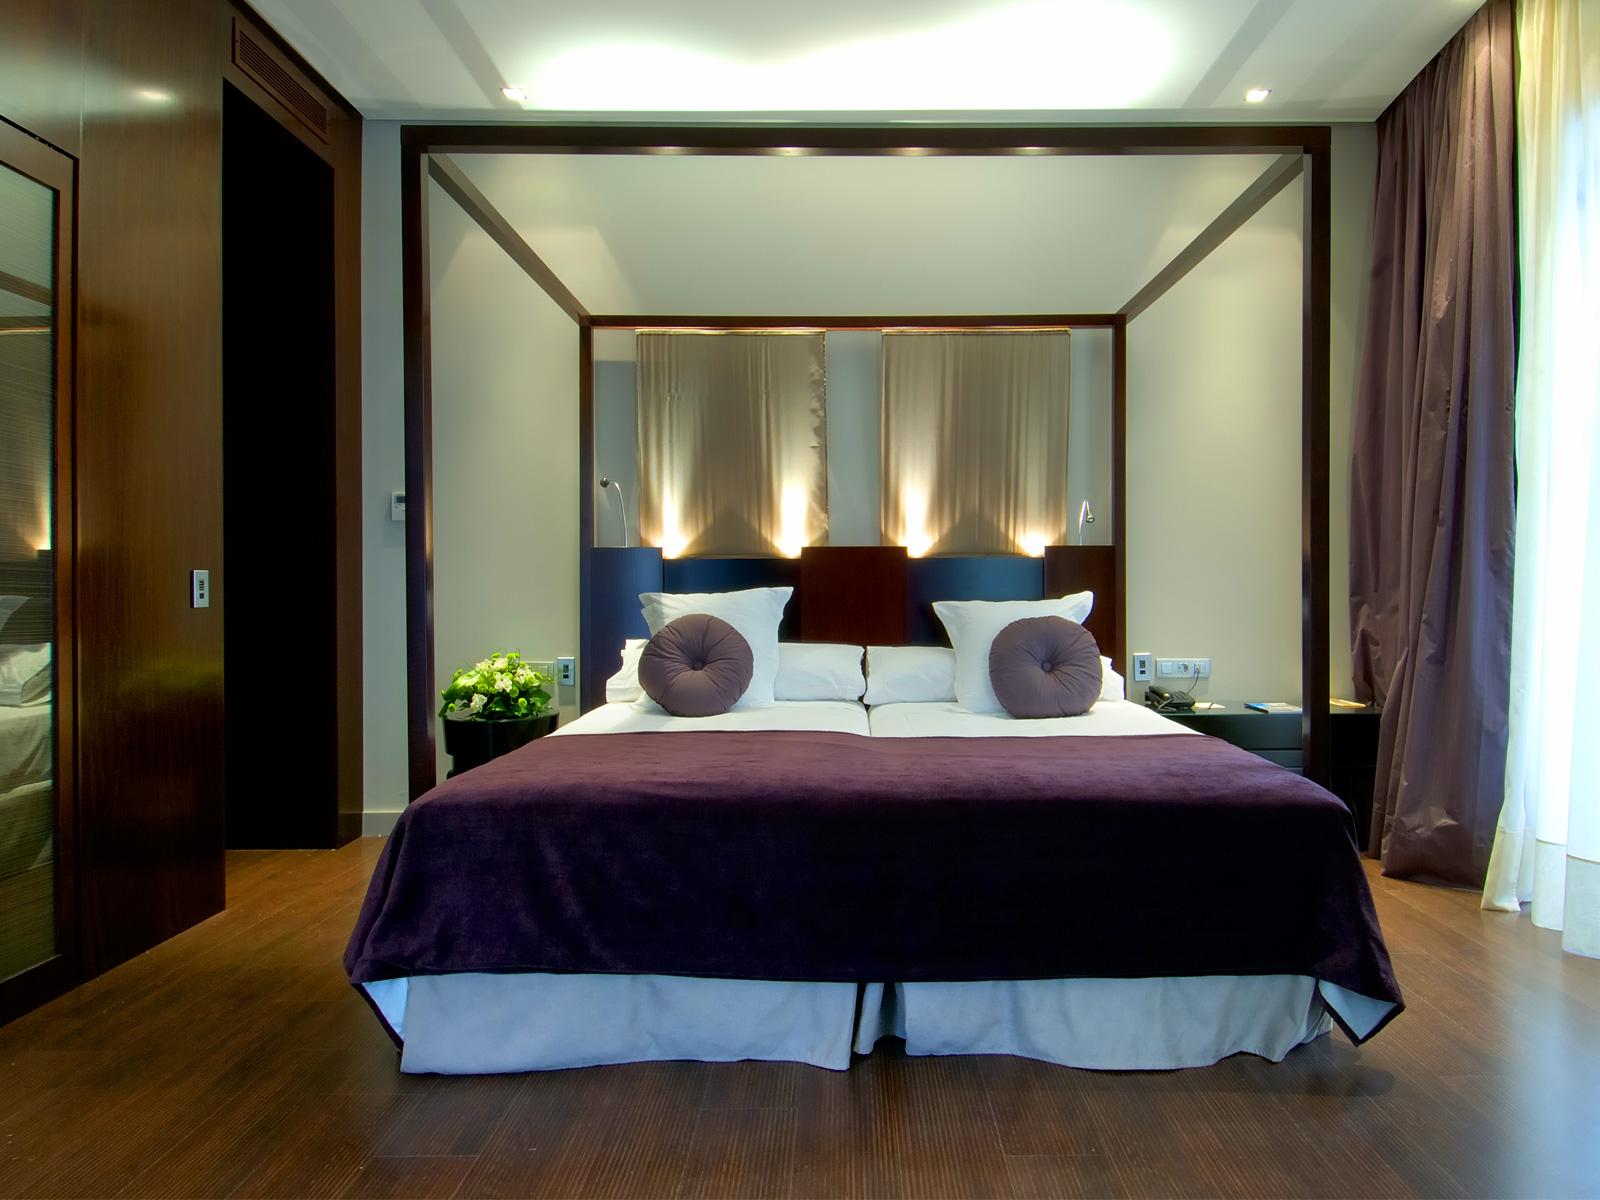 Standard Room - Vincci Palace 4*